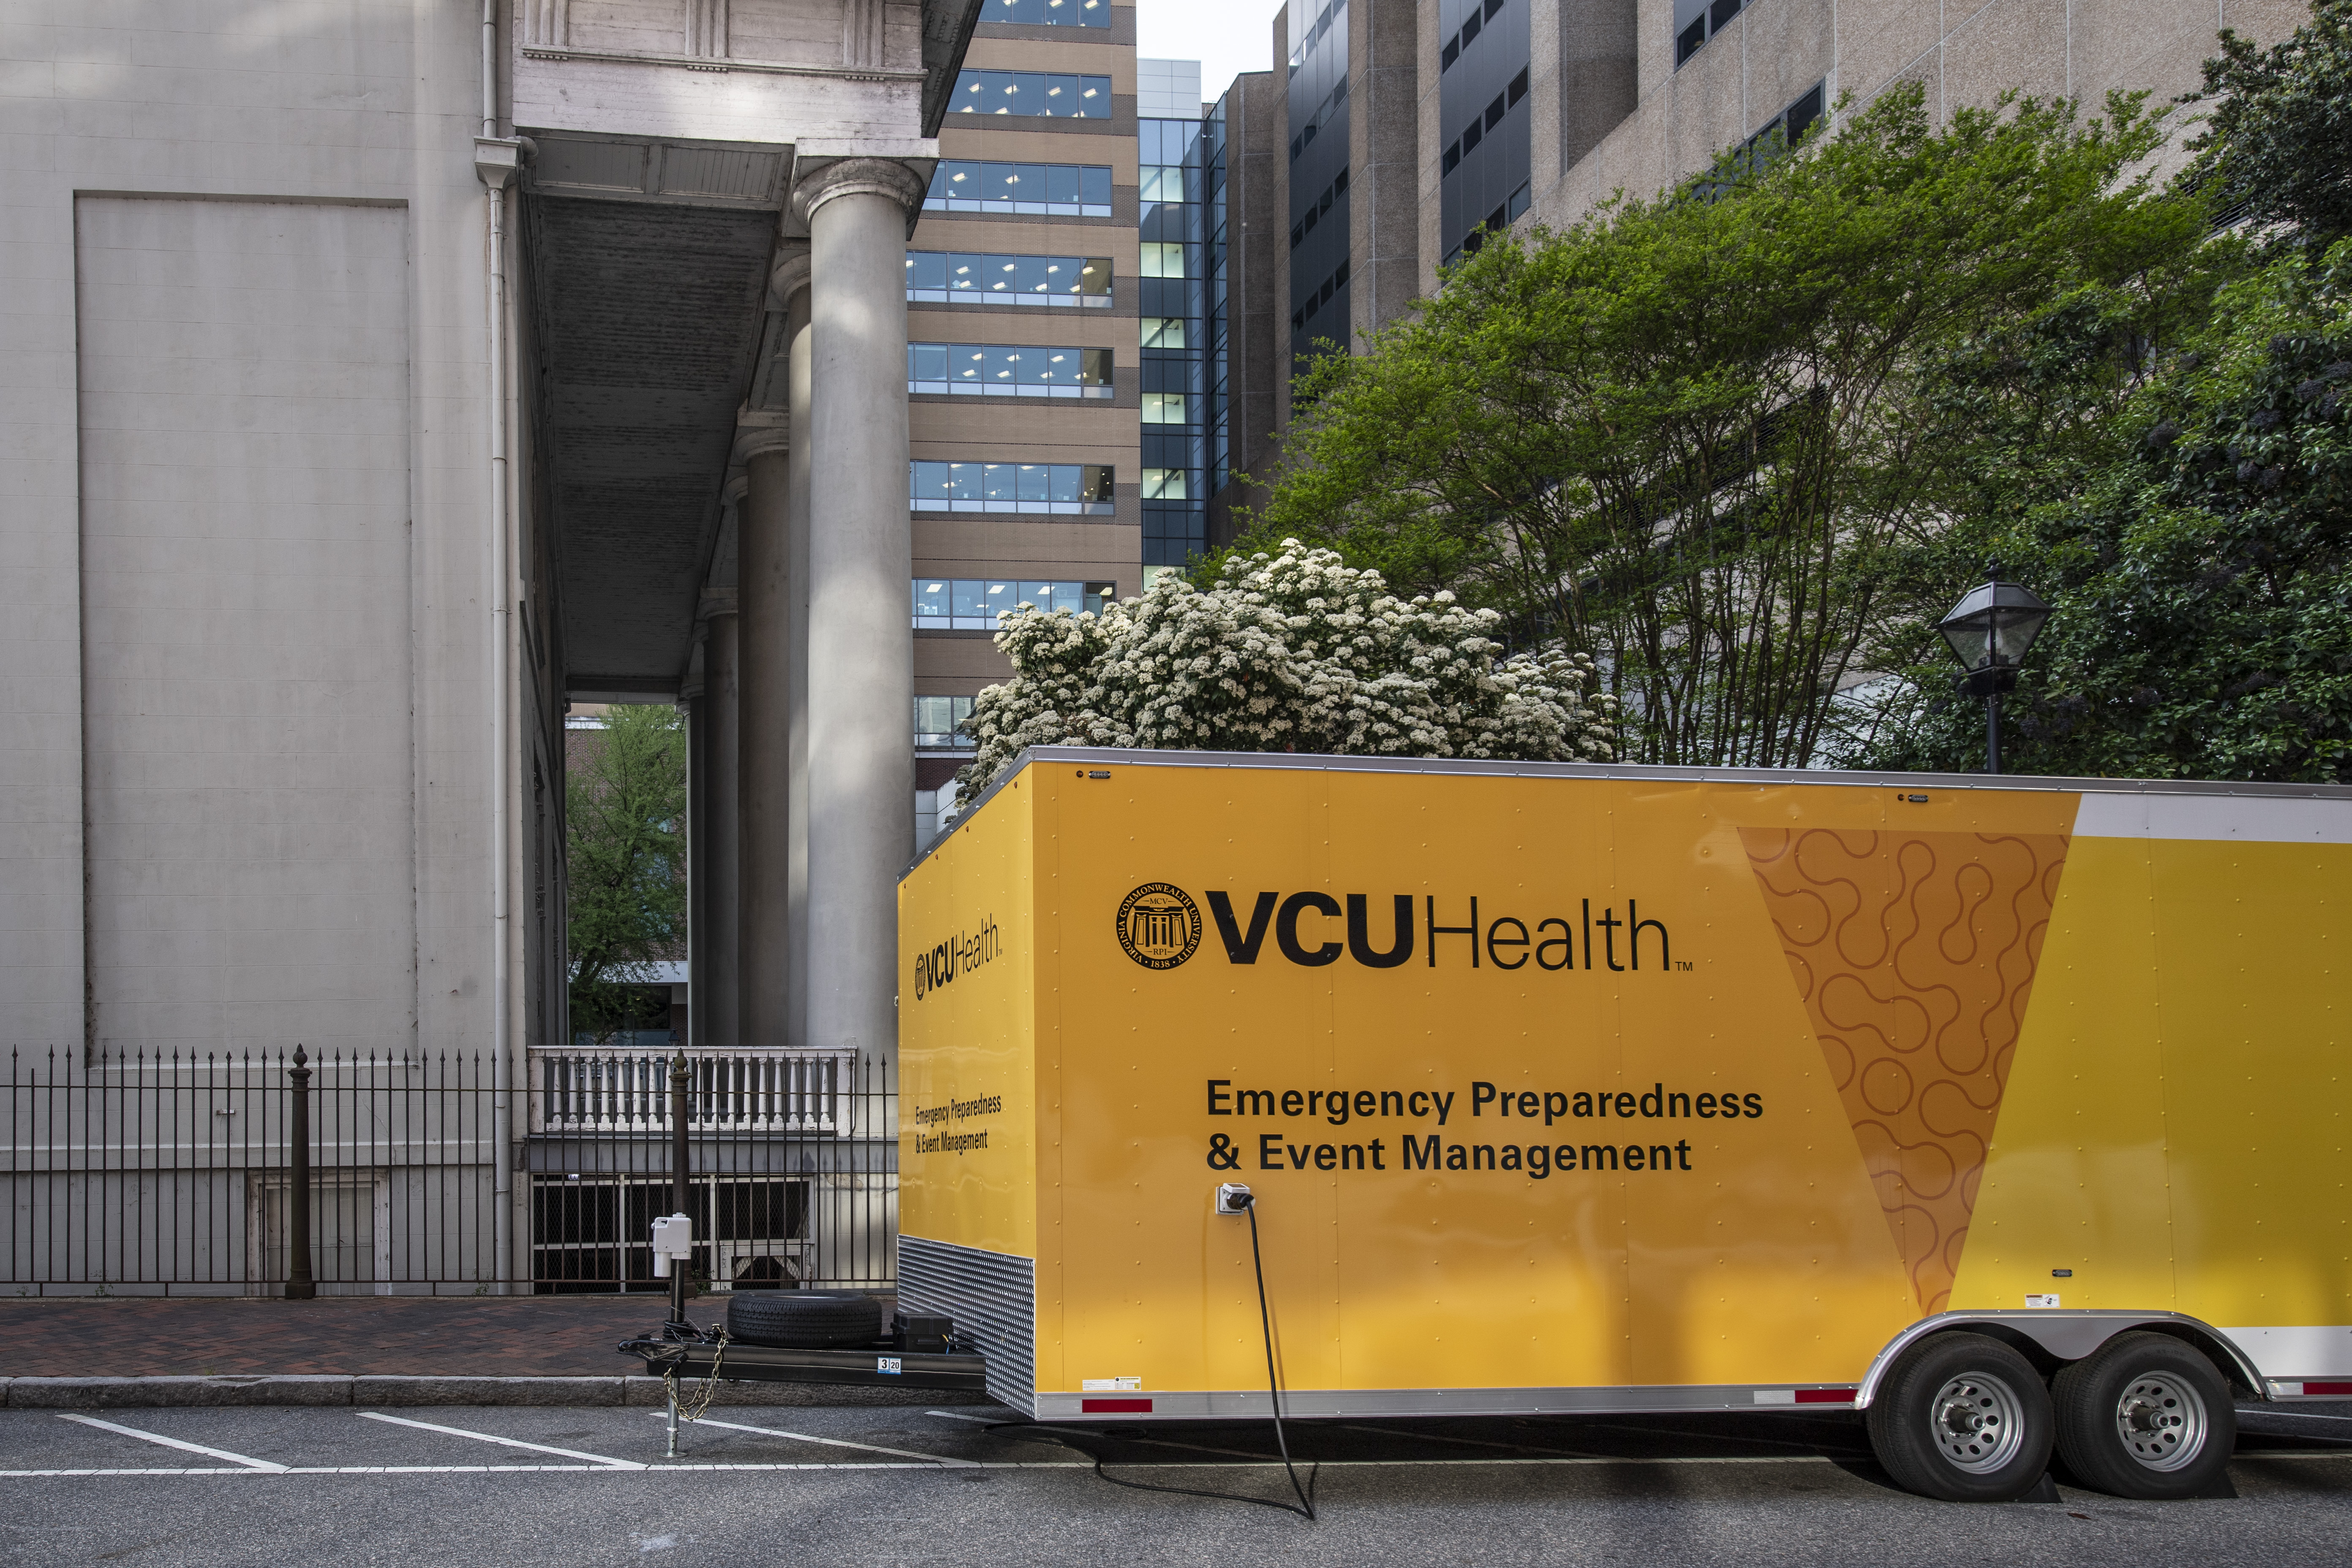 VCU Emergency Preparedness